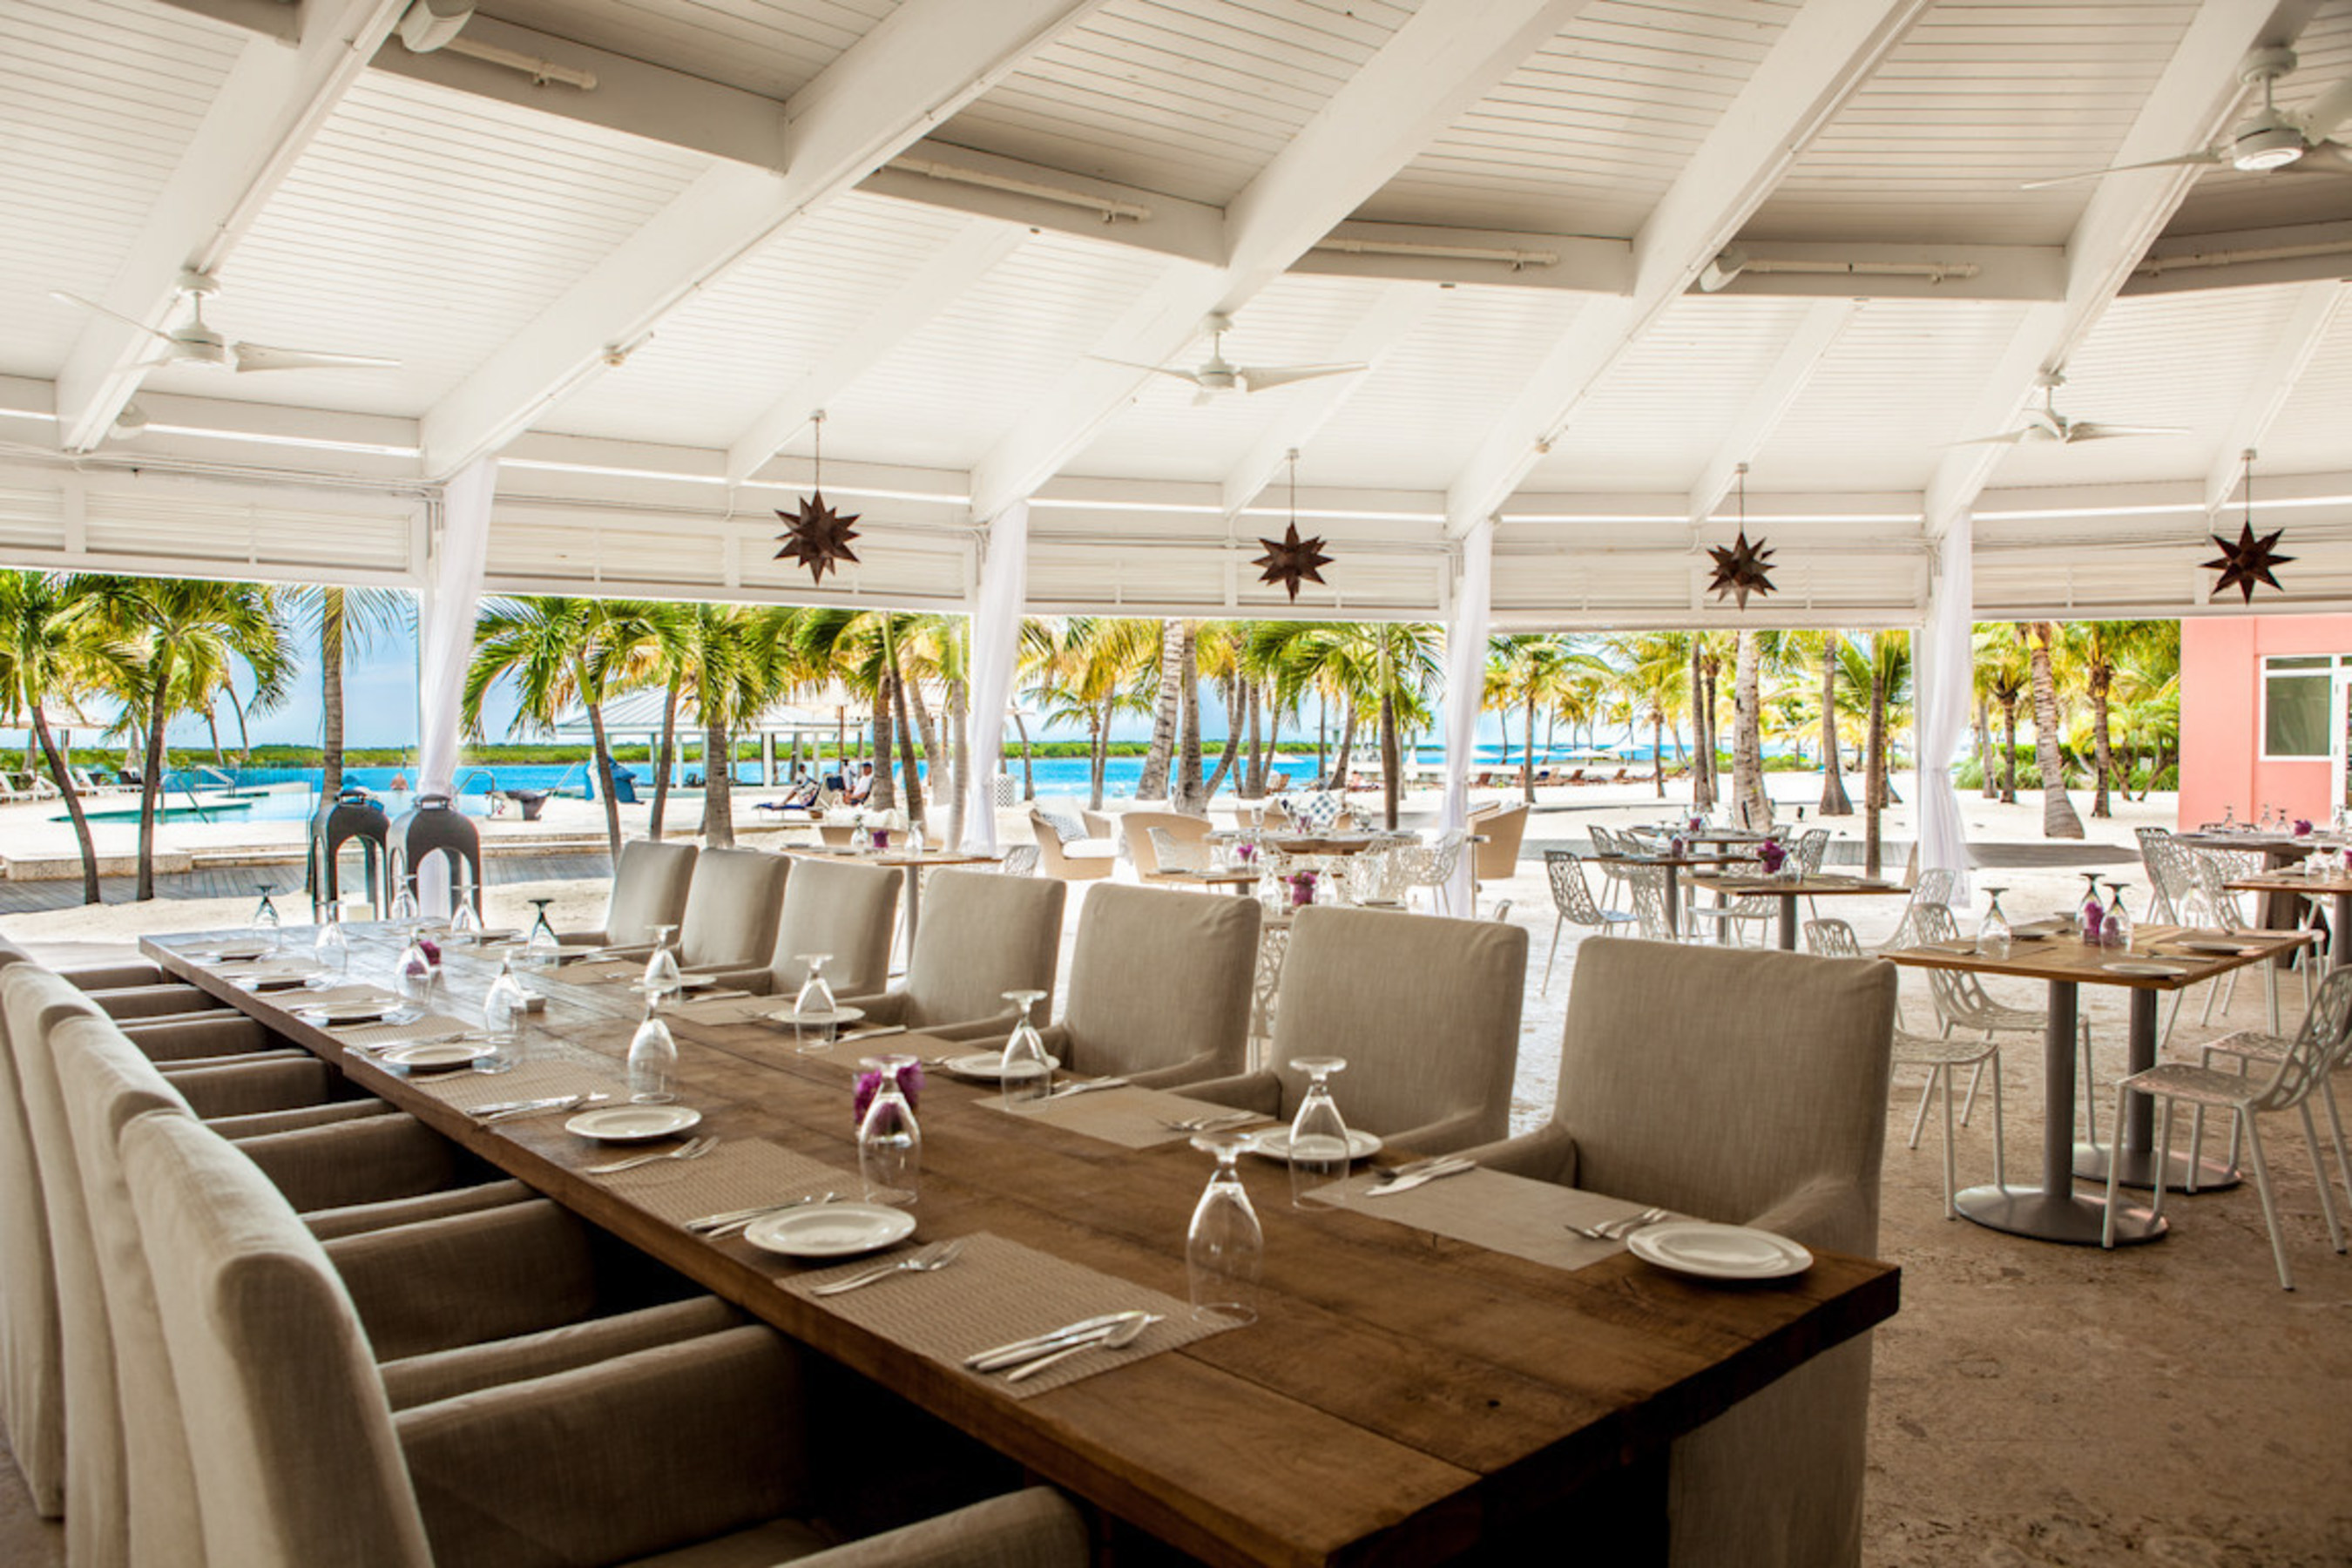 Fire U0026 Ice Restaurant, Turks And Caicos